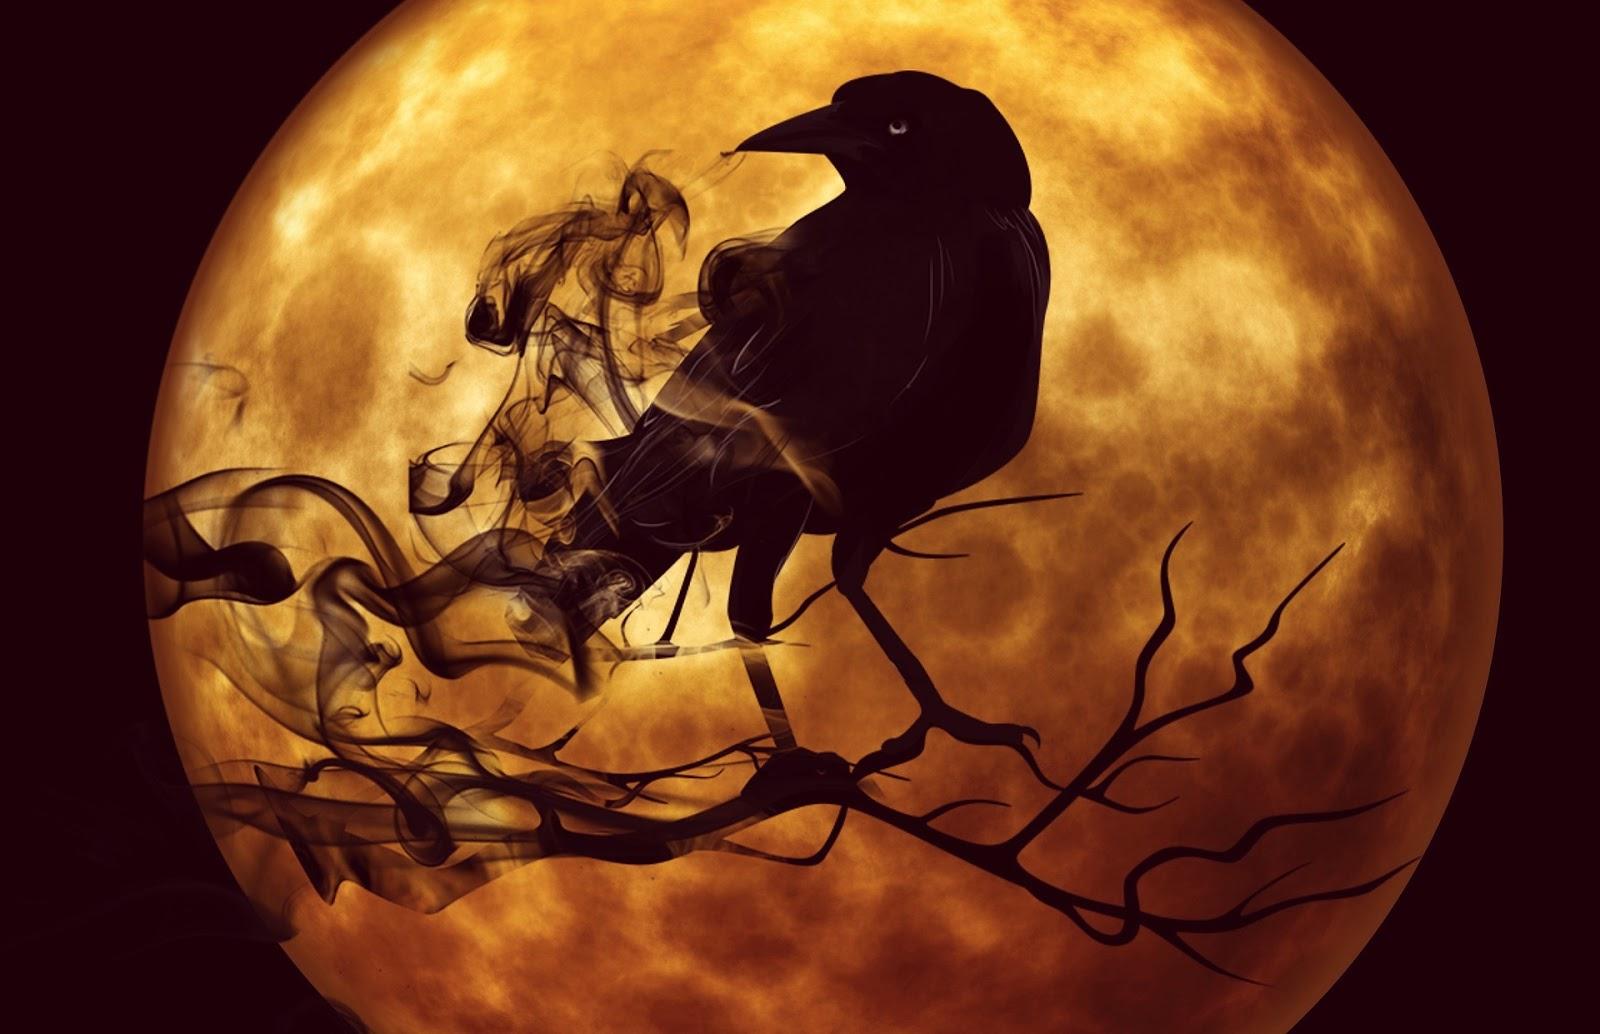 RavenMoon-1.jpg